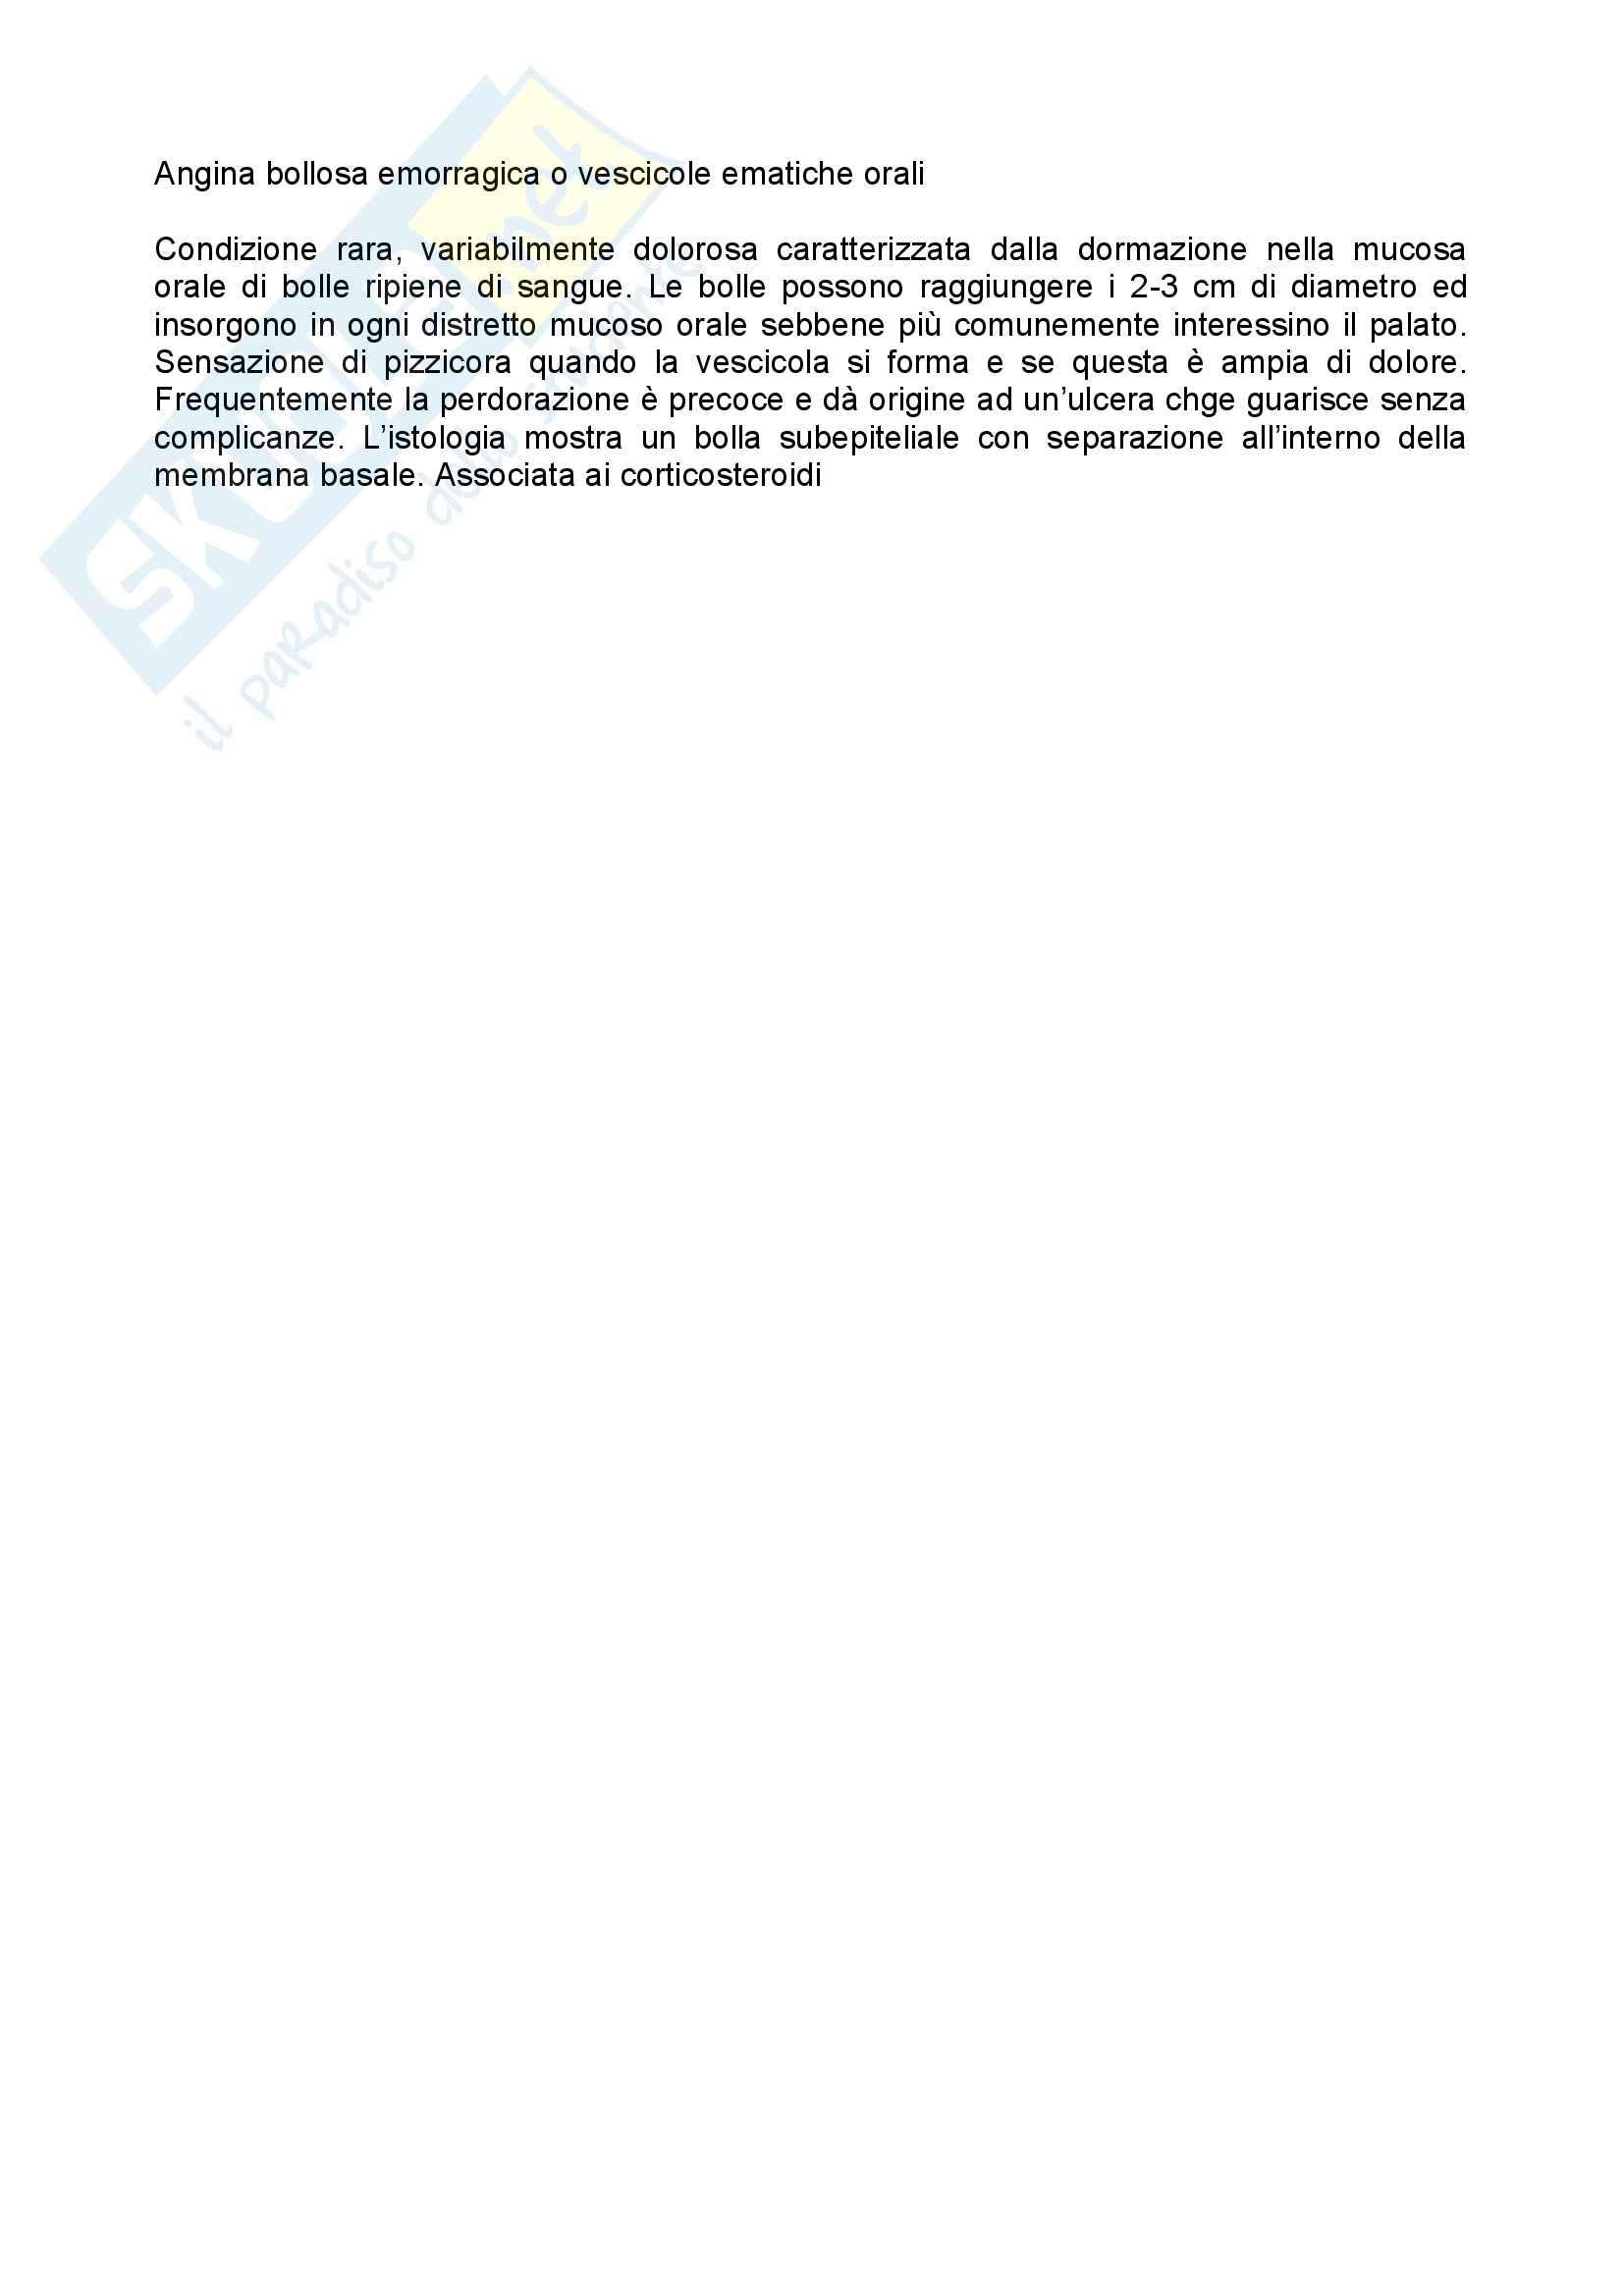 Anatomia patologica - angina bollosa emorragica